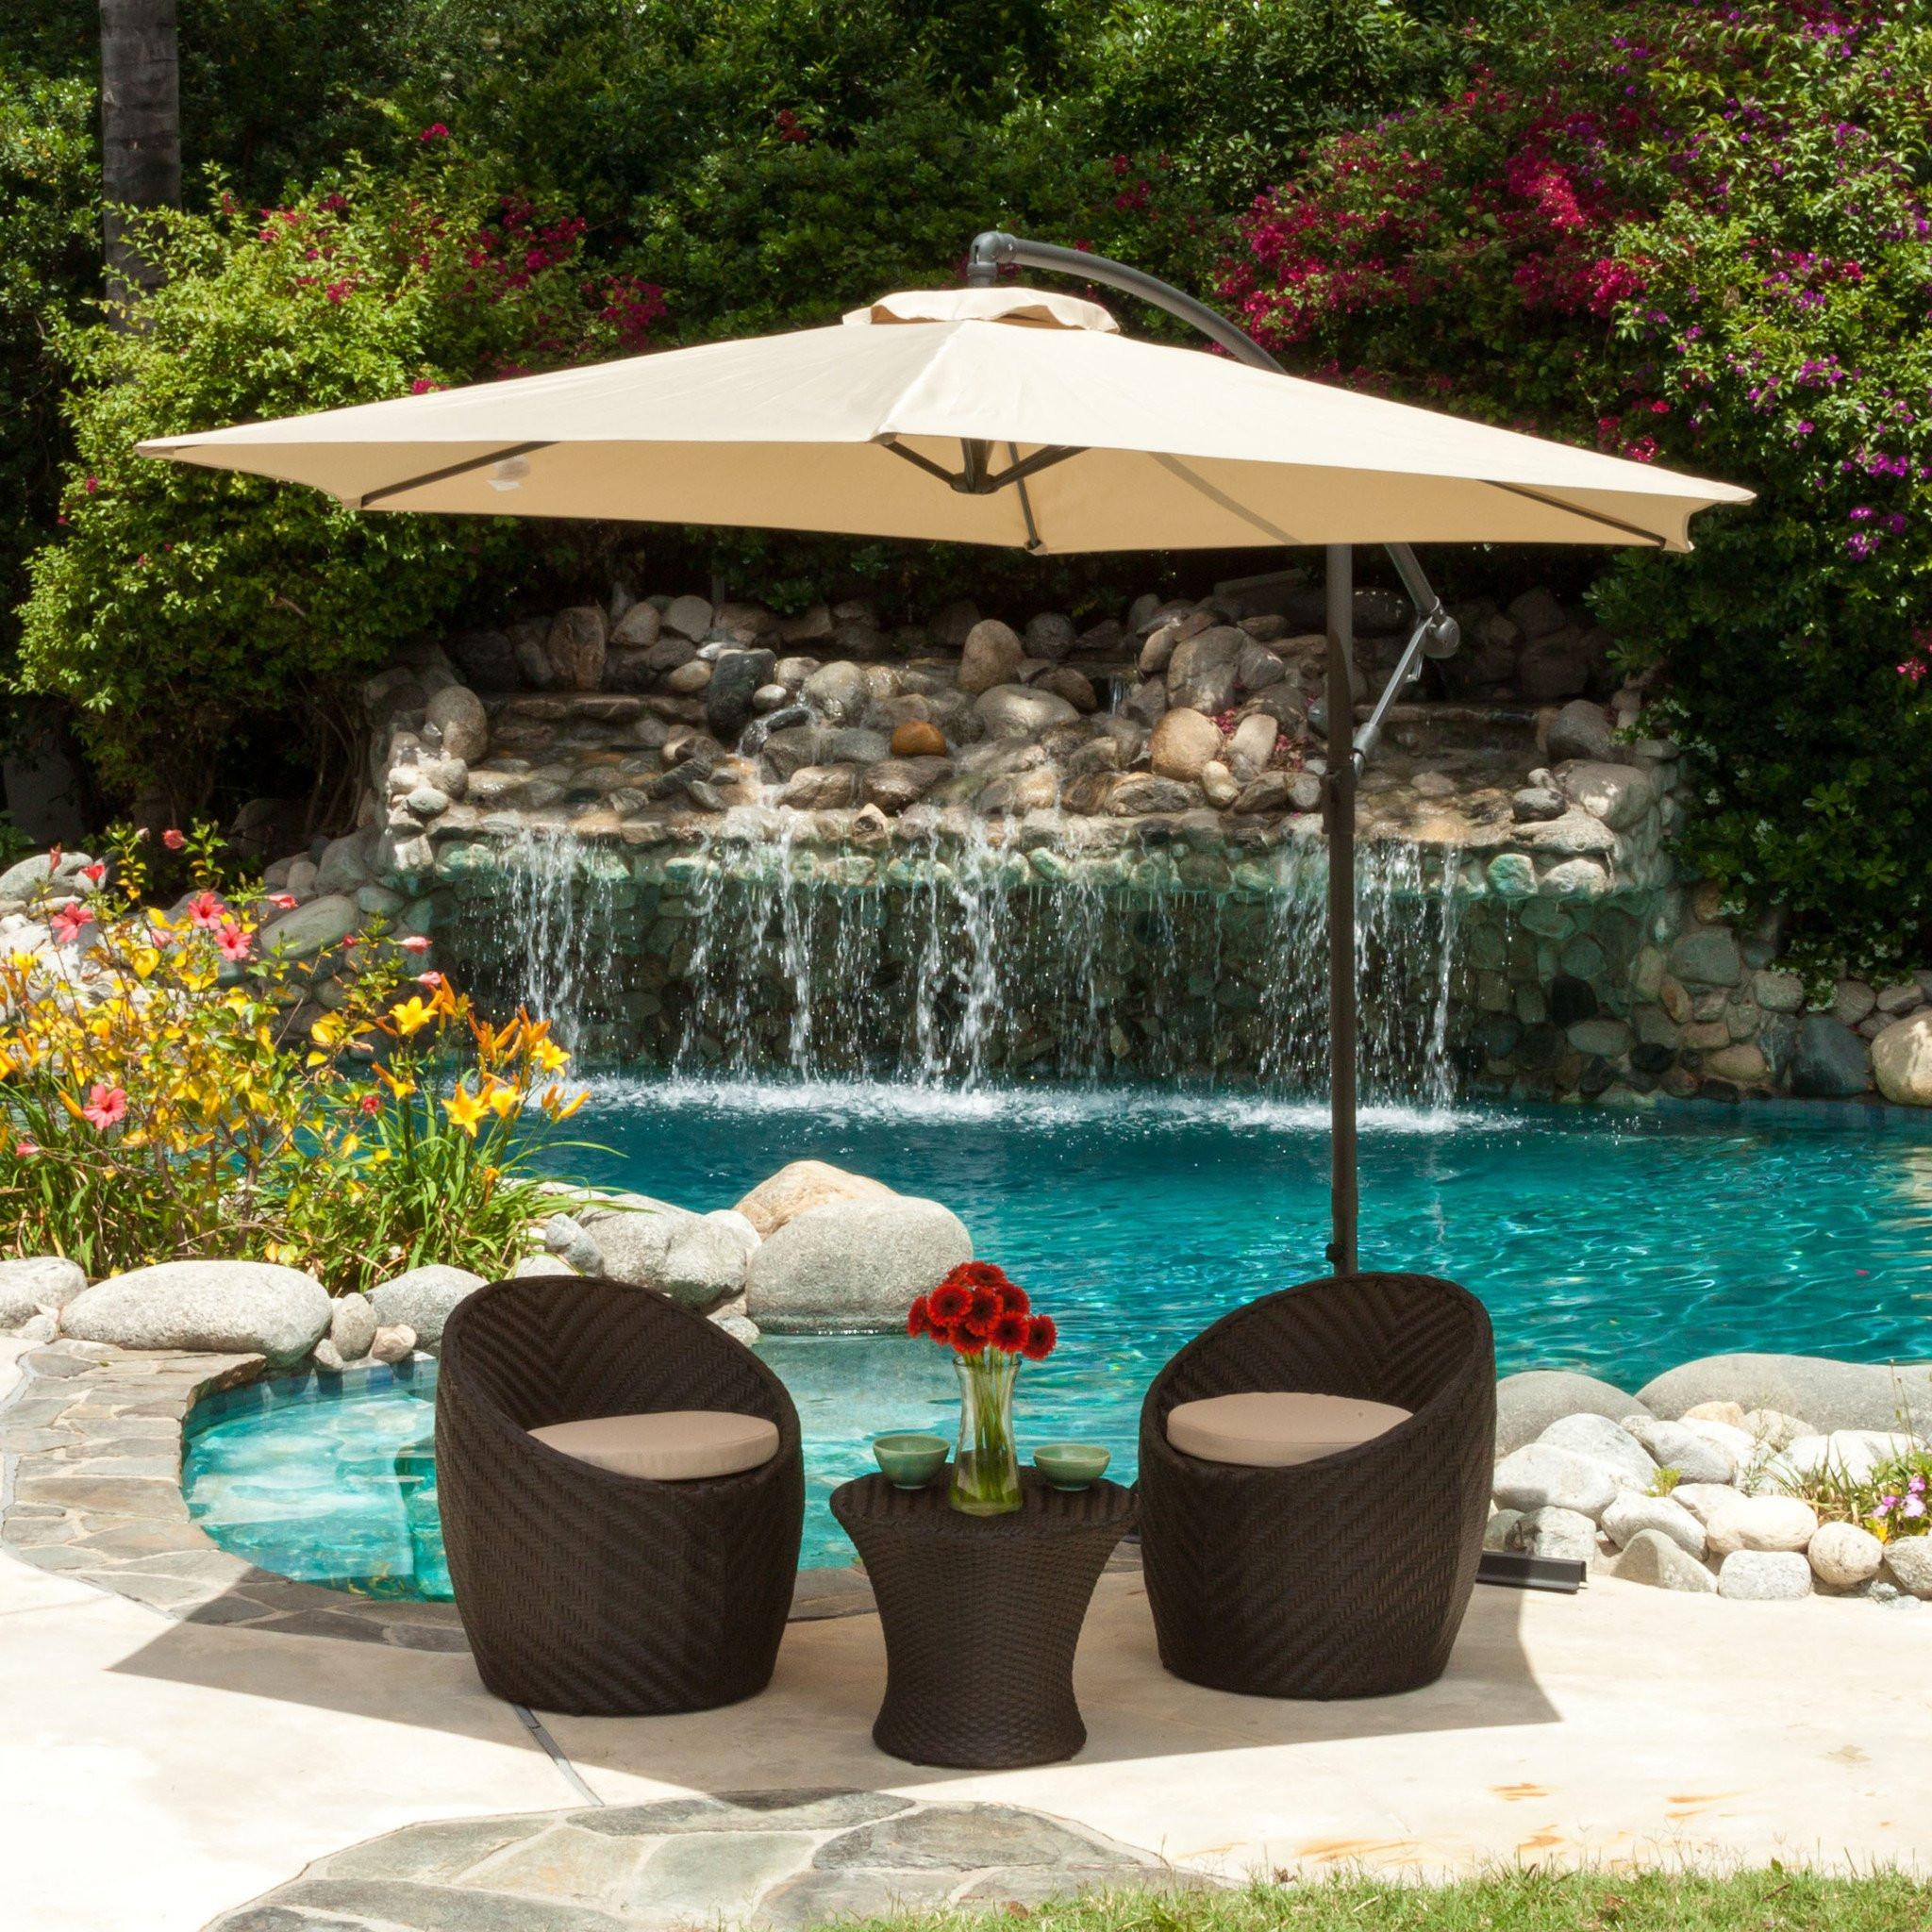 Acosta Outdoor Cantilever Patio Canopy Waterproof...